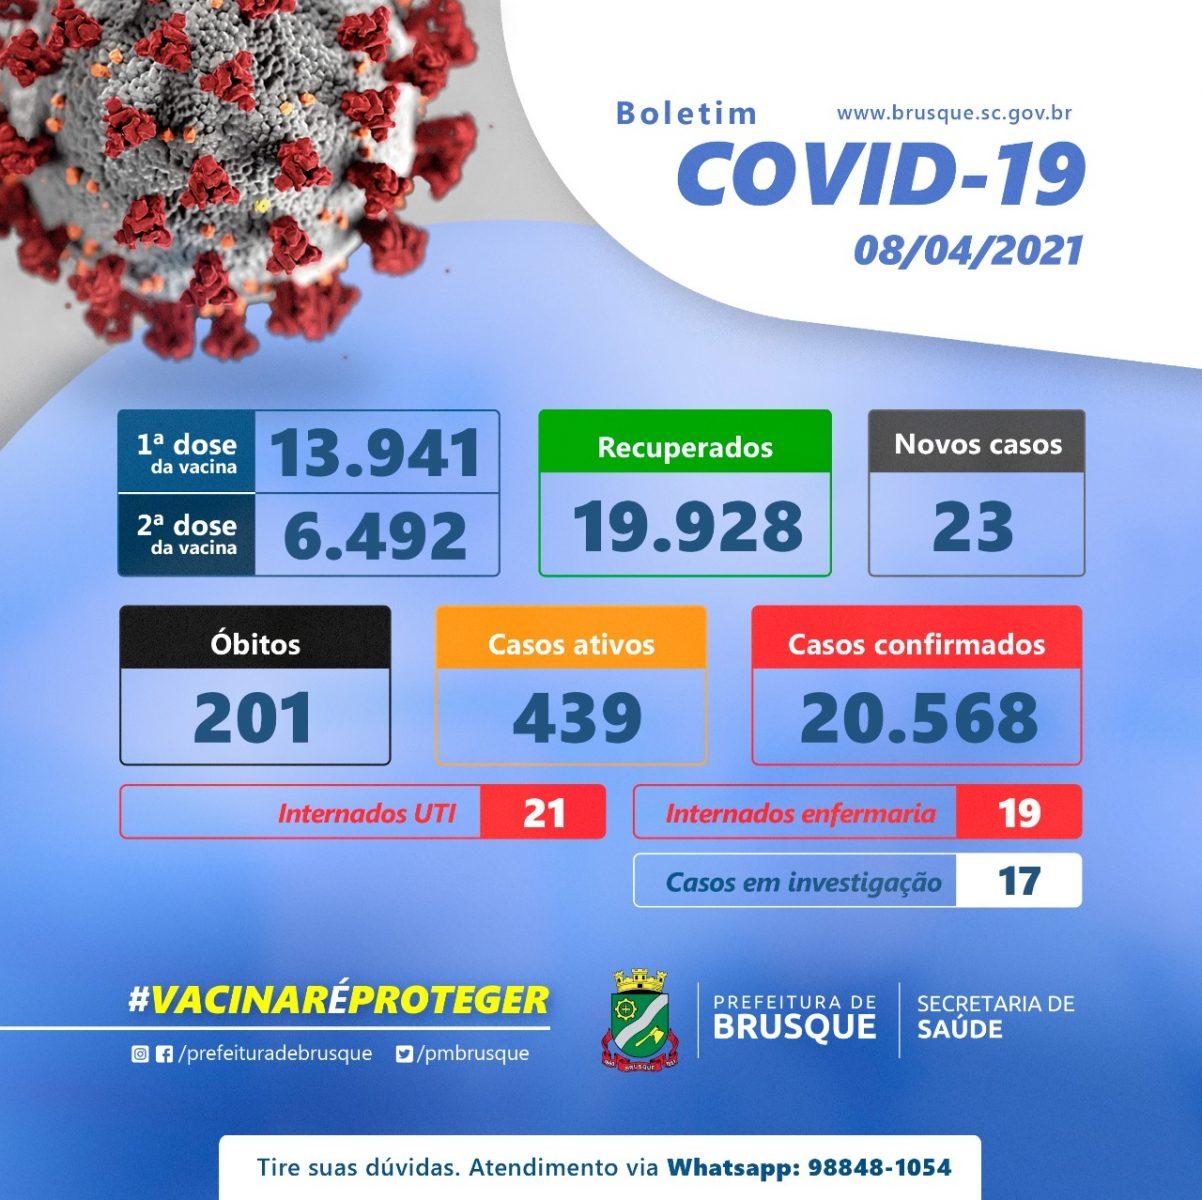 Covid 19: Confira o boletim epidemiológico desta quinta-feira (08)